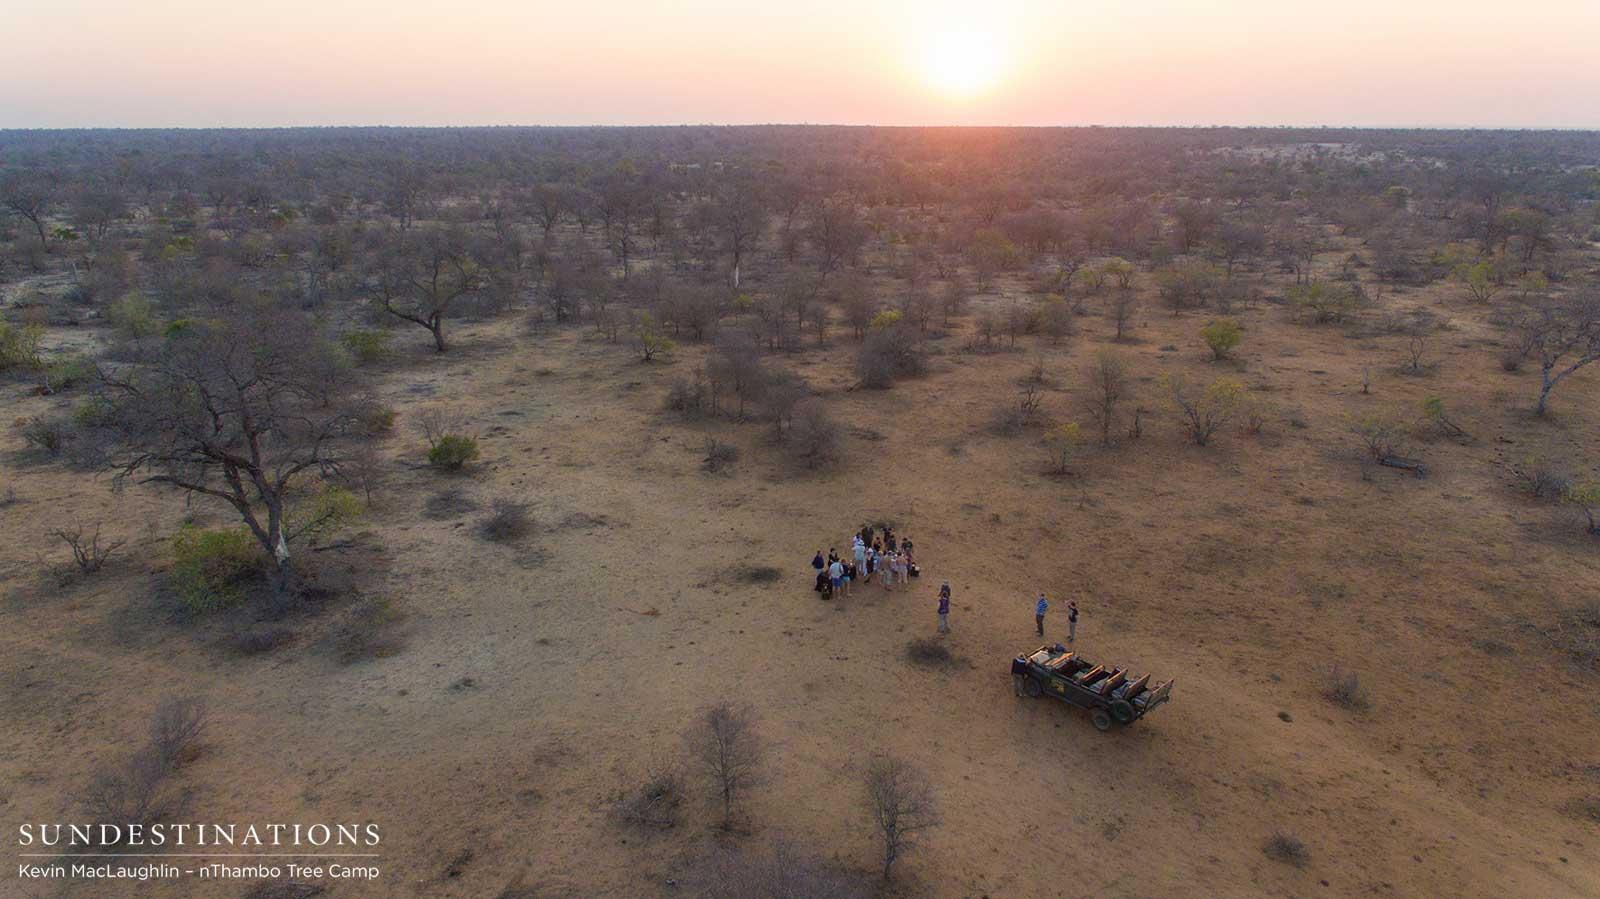 Wine Tasting in the Kruger Wilderness